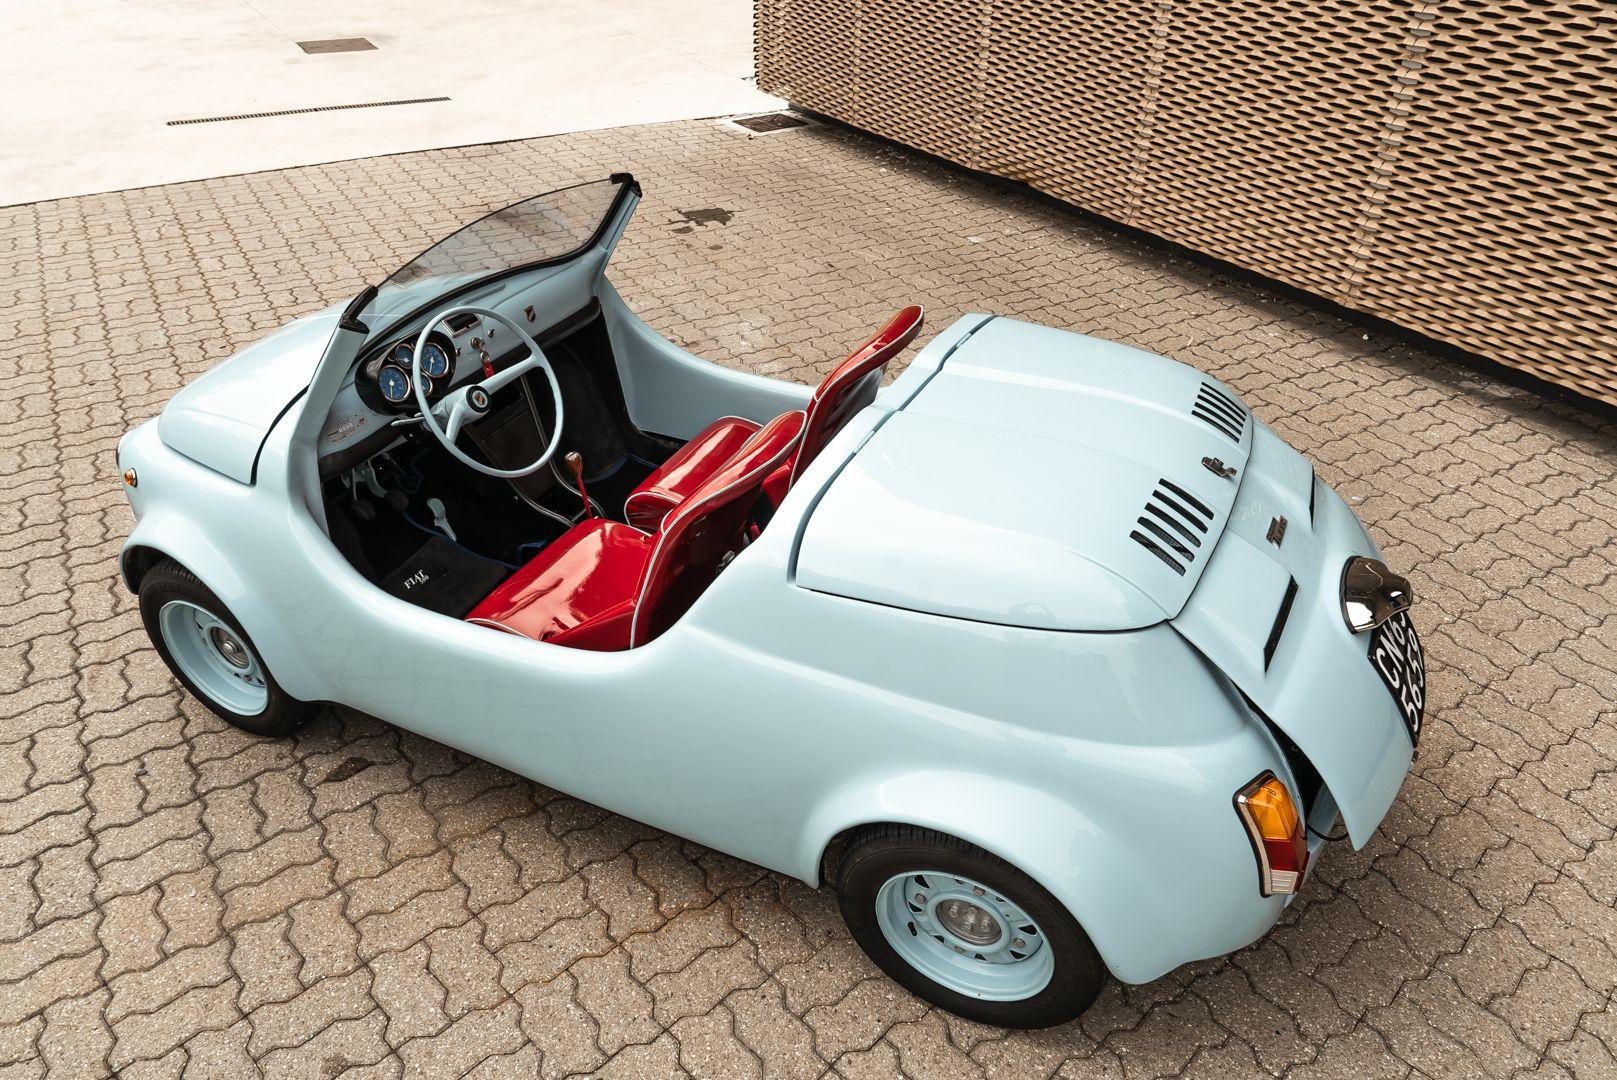 1971 Fiat 500 F Replica Speedster 80057